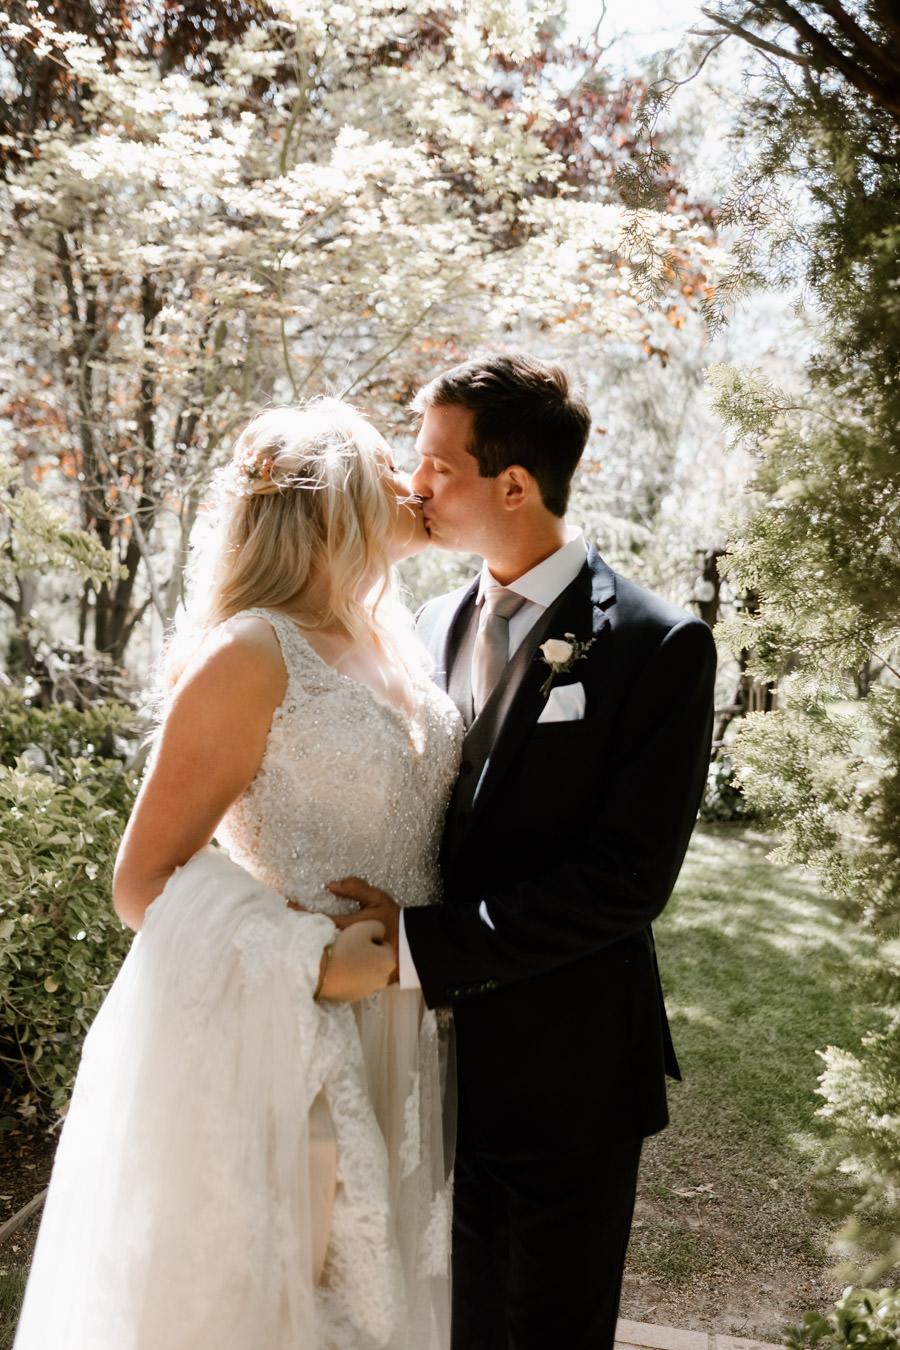 sacred mountain julian wedding sharing a sweet kiss under beautiful sunlight